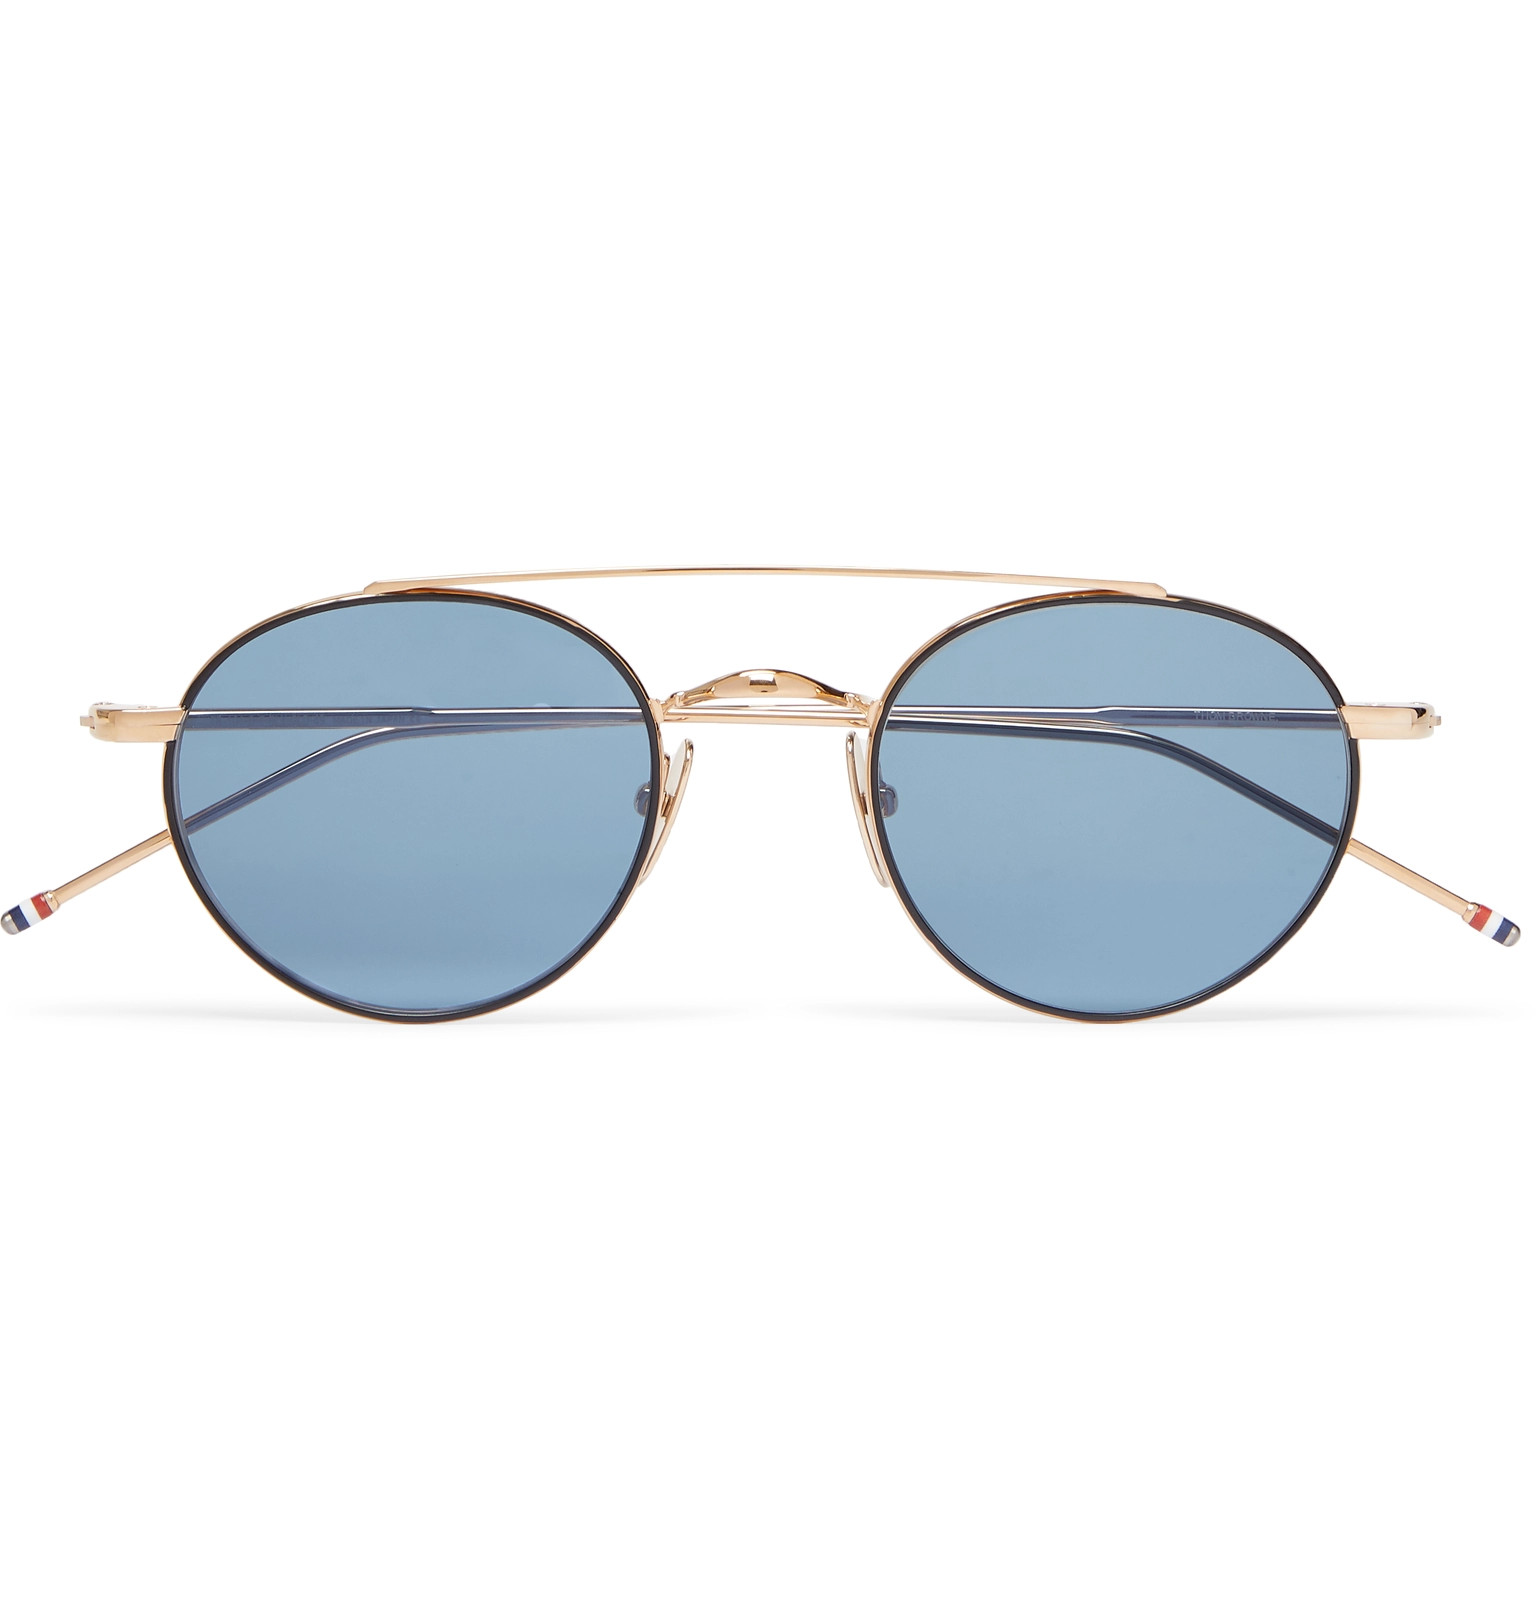 1f40e0ef70a8 Thom Browne - Round-Frame Gold-Tone Sunglasses